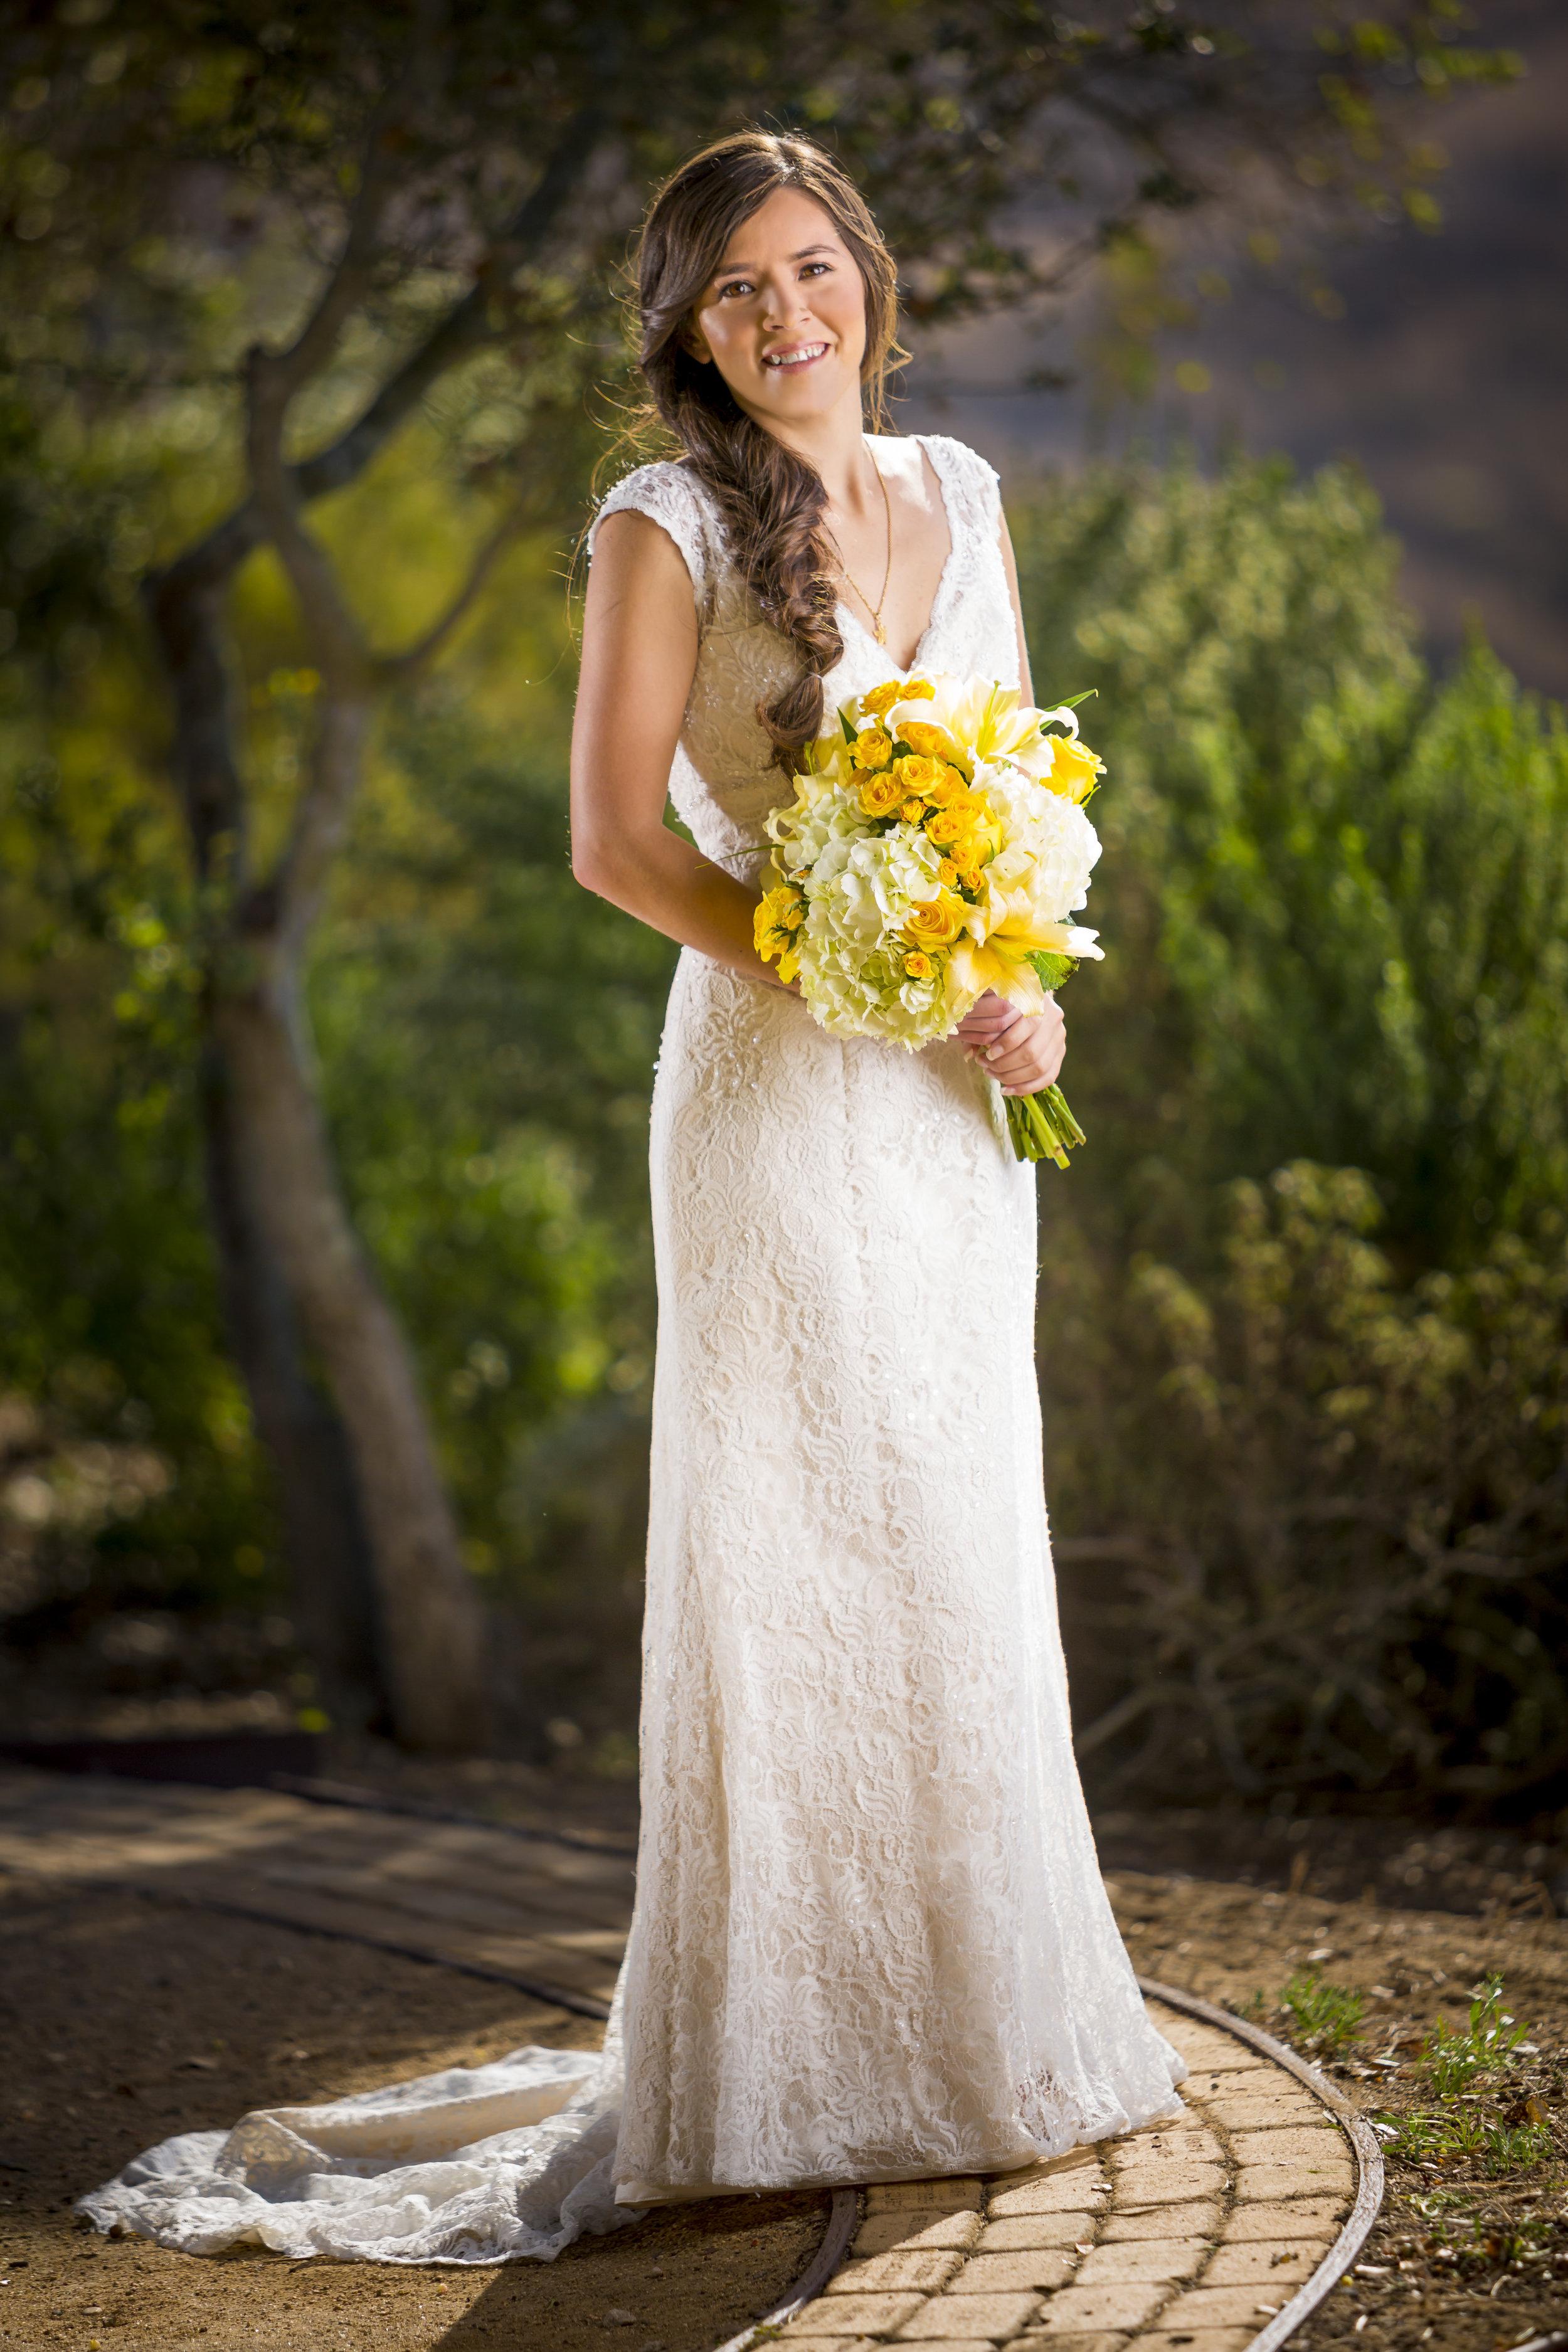 Bridesmaids-2680-2.jpg